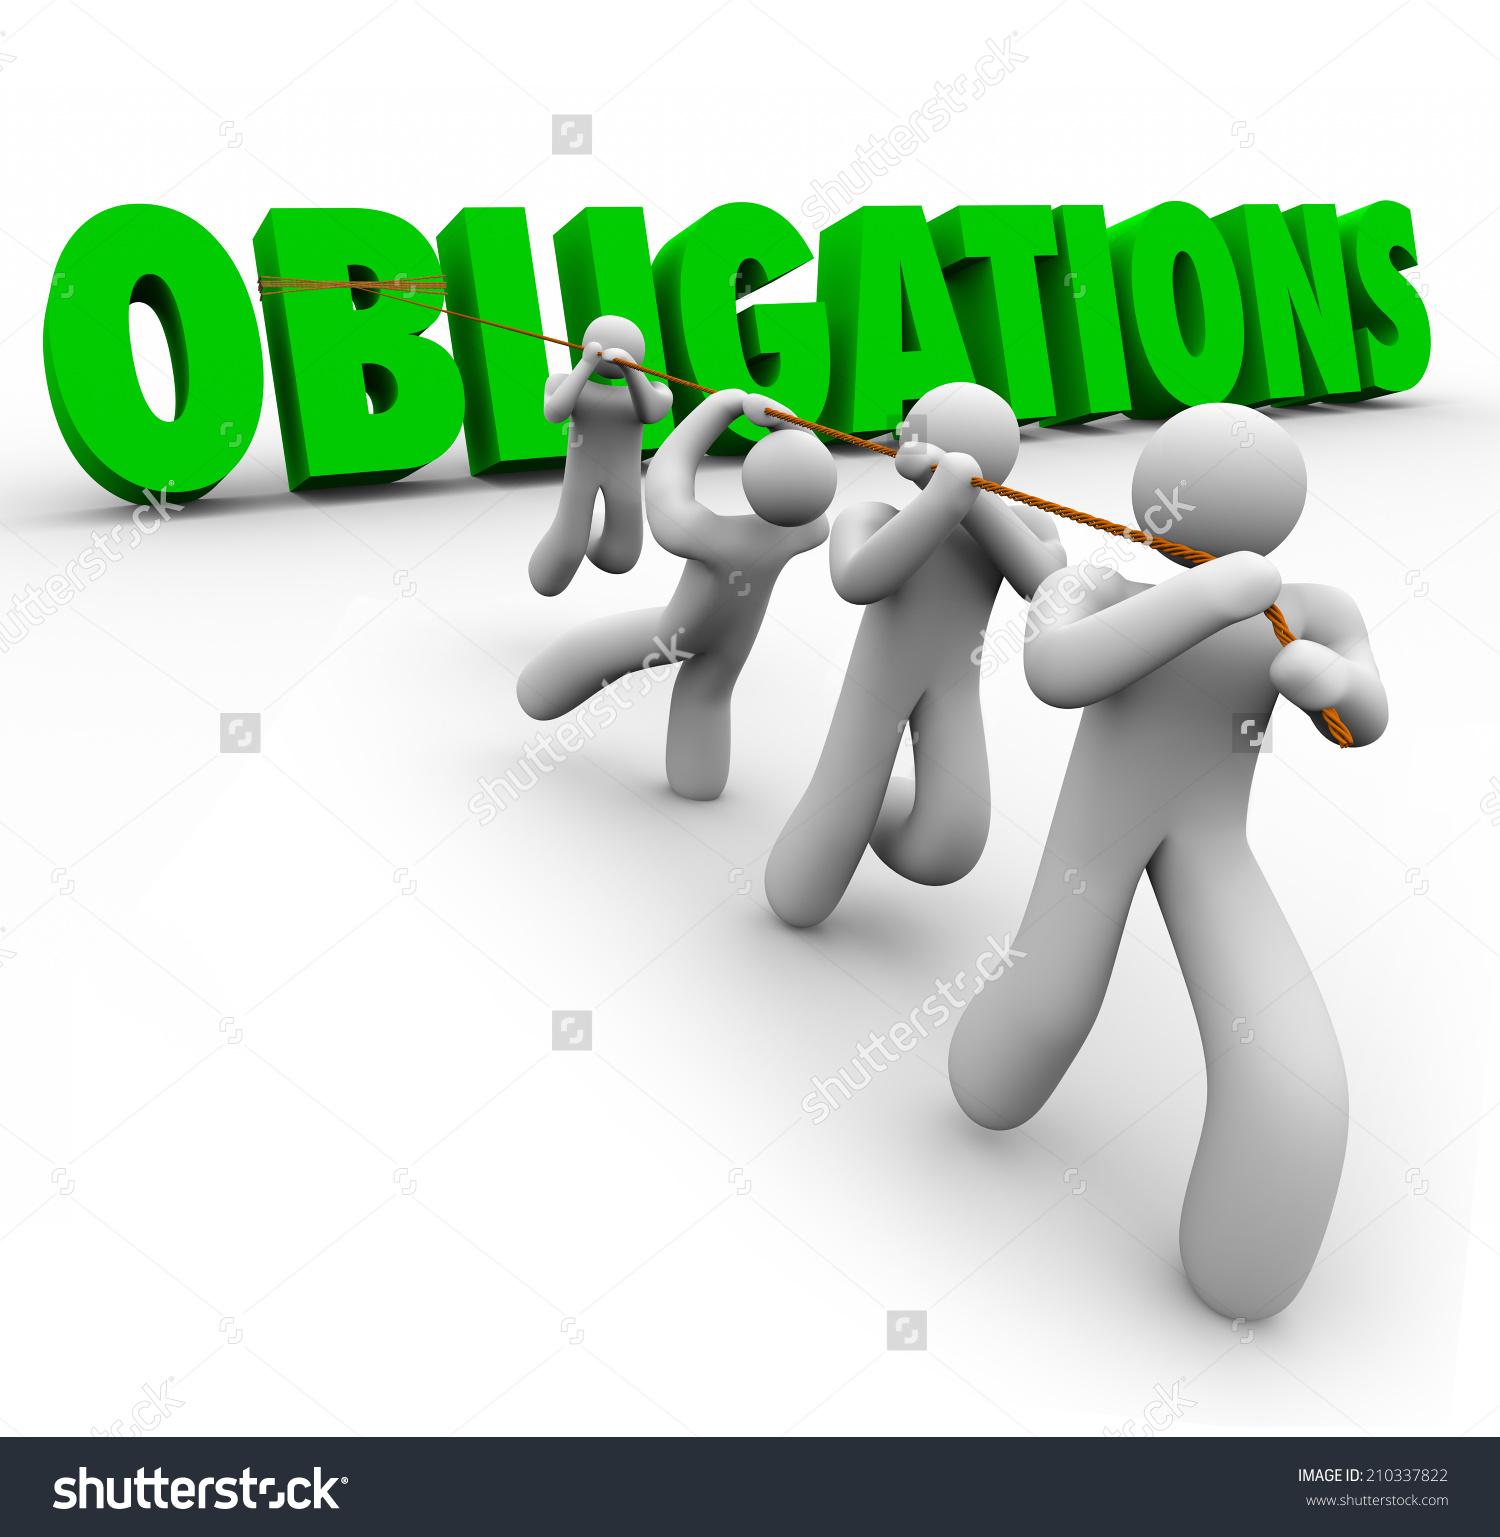 Obligations clipart.